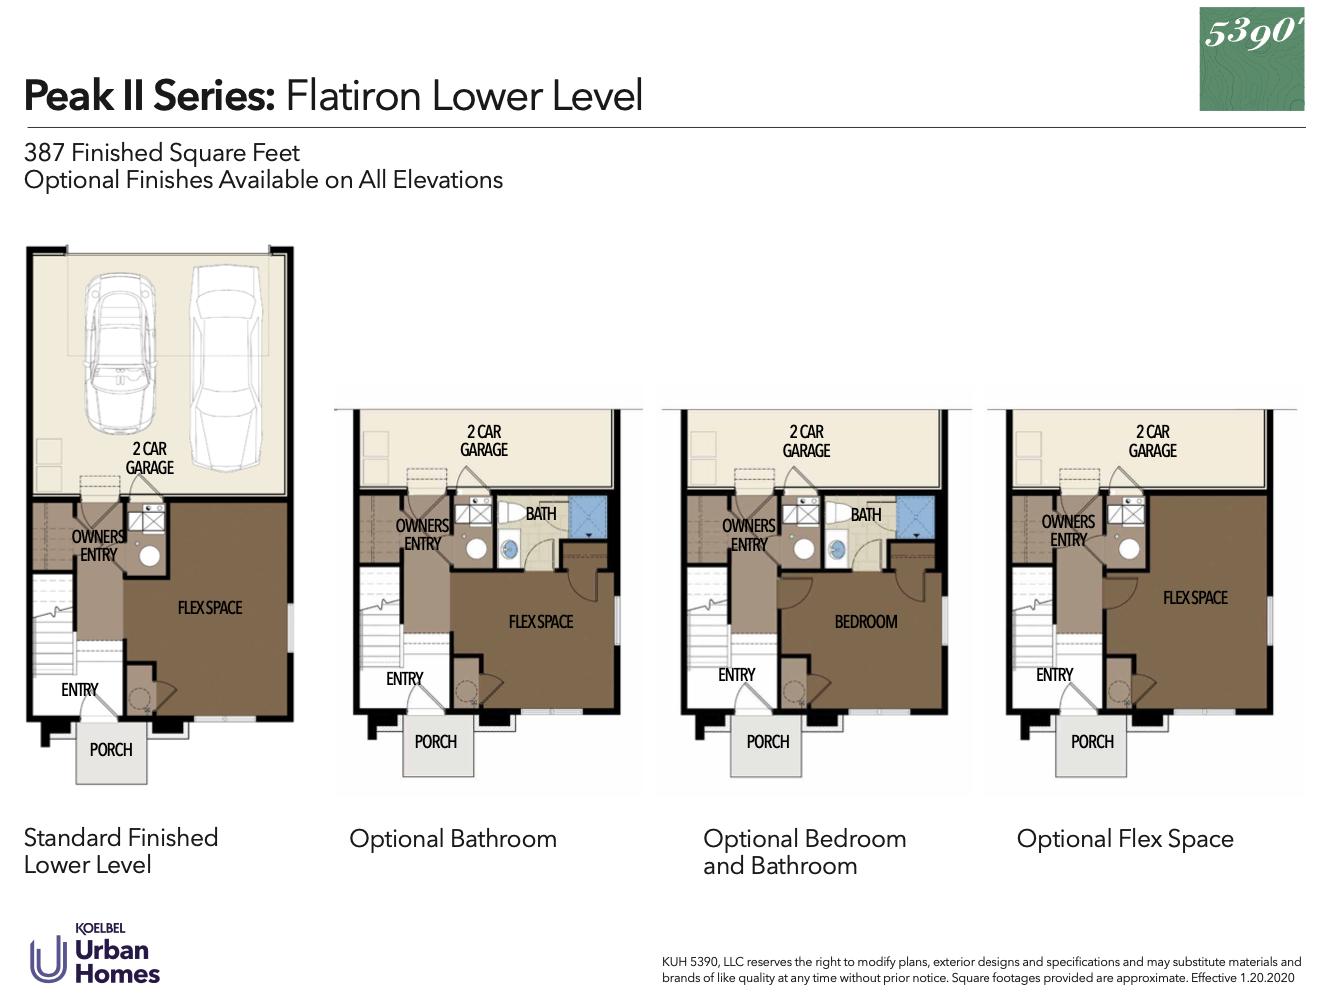 5390' Community by Koelbel in the Berkeley Tennyson Neighborhood Denver New Construction Homes For Sale Peak II Flatiron Floorplan1